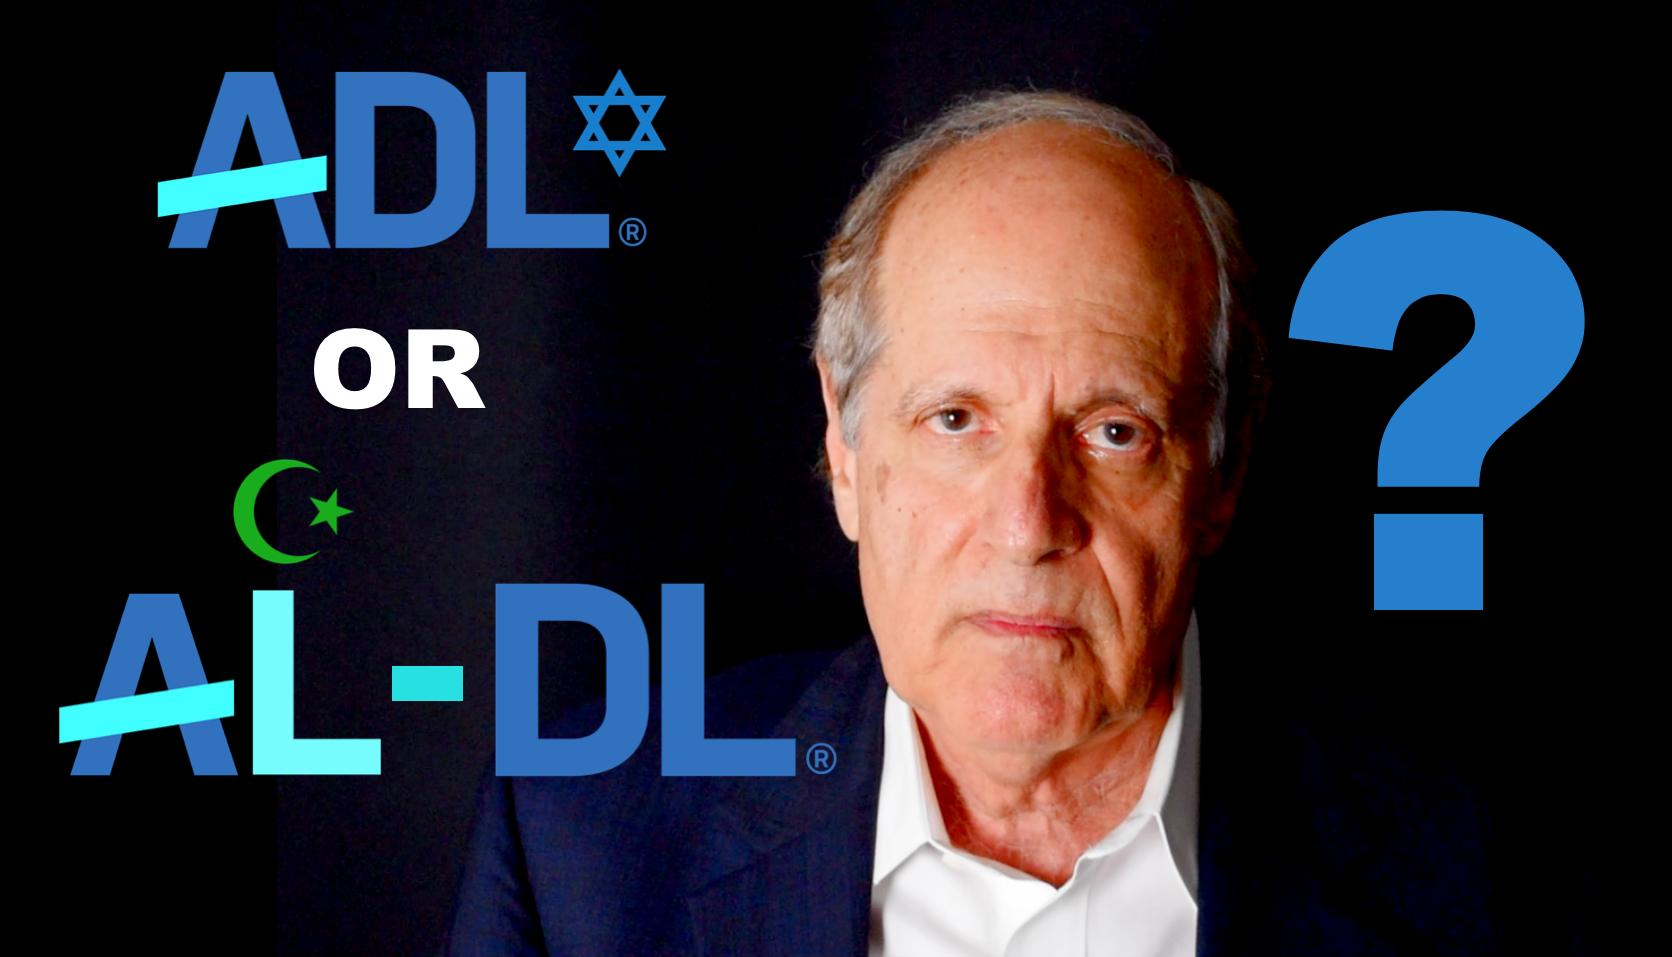 Scandal — As ADL Covers Up Muslim Anti-Semitism